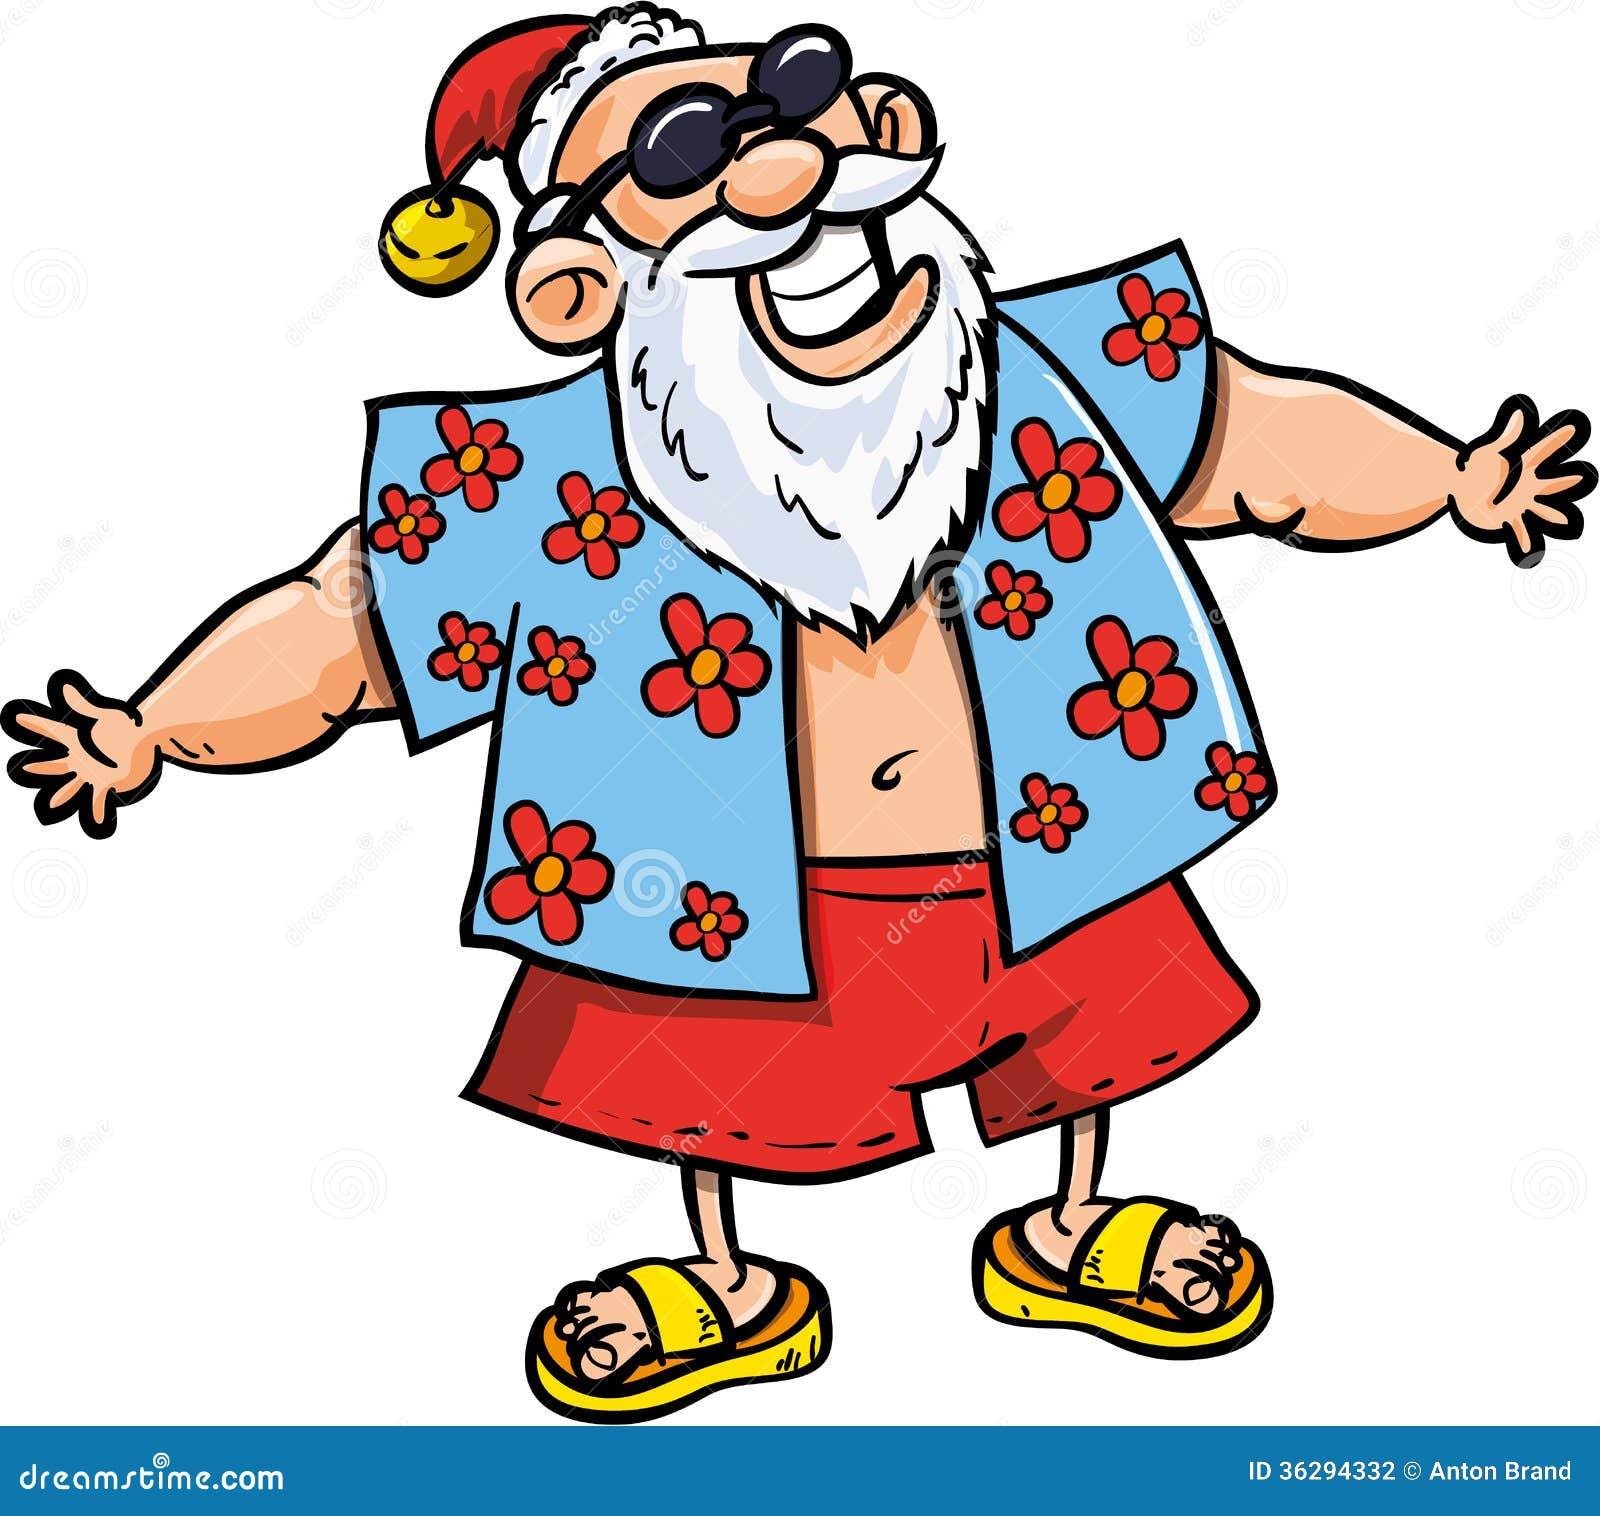 Cartoon Santa on vacation stock vector. Illustration of ... (1300 x 1248 Pixel)